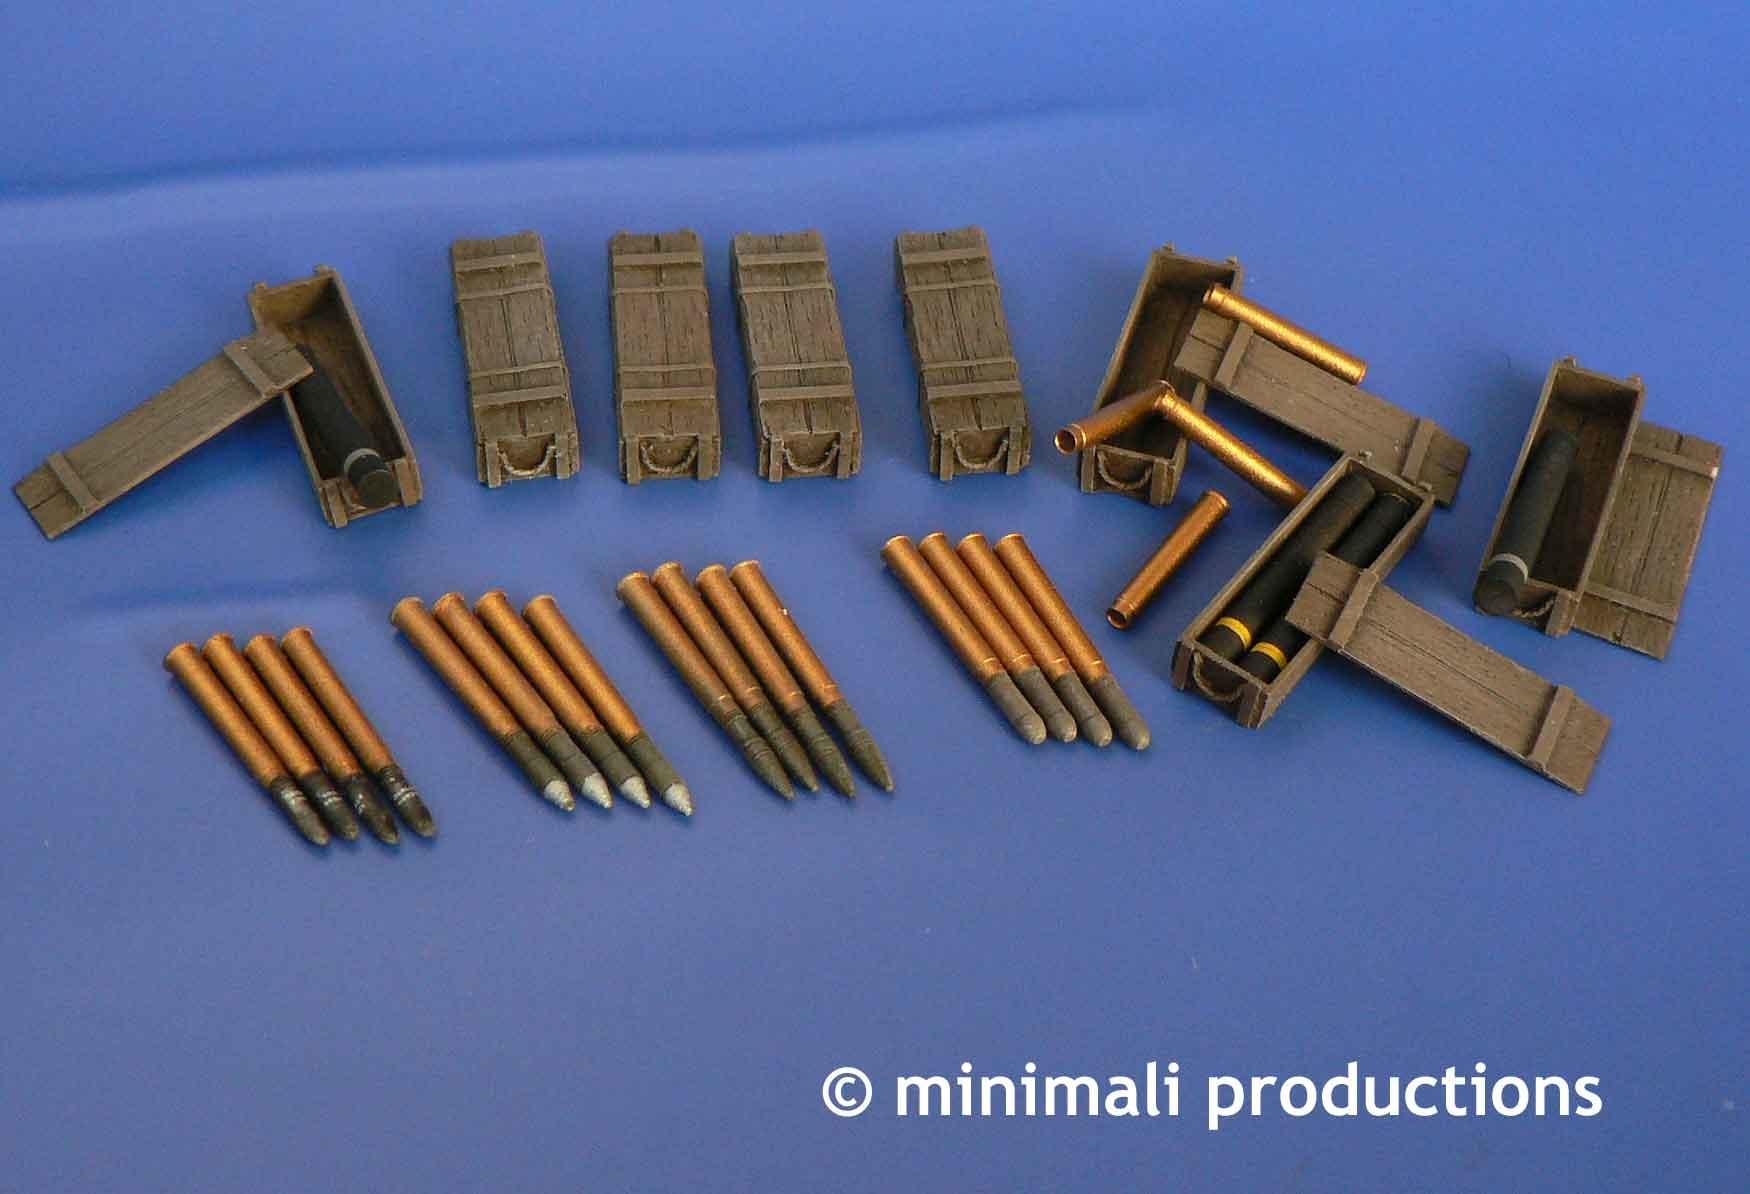 Minimali Productions U.S.76Mm Ammunition For M4 Sherman - Scale 1/48 - Minimali Productions - Mii 045